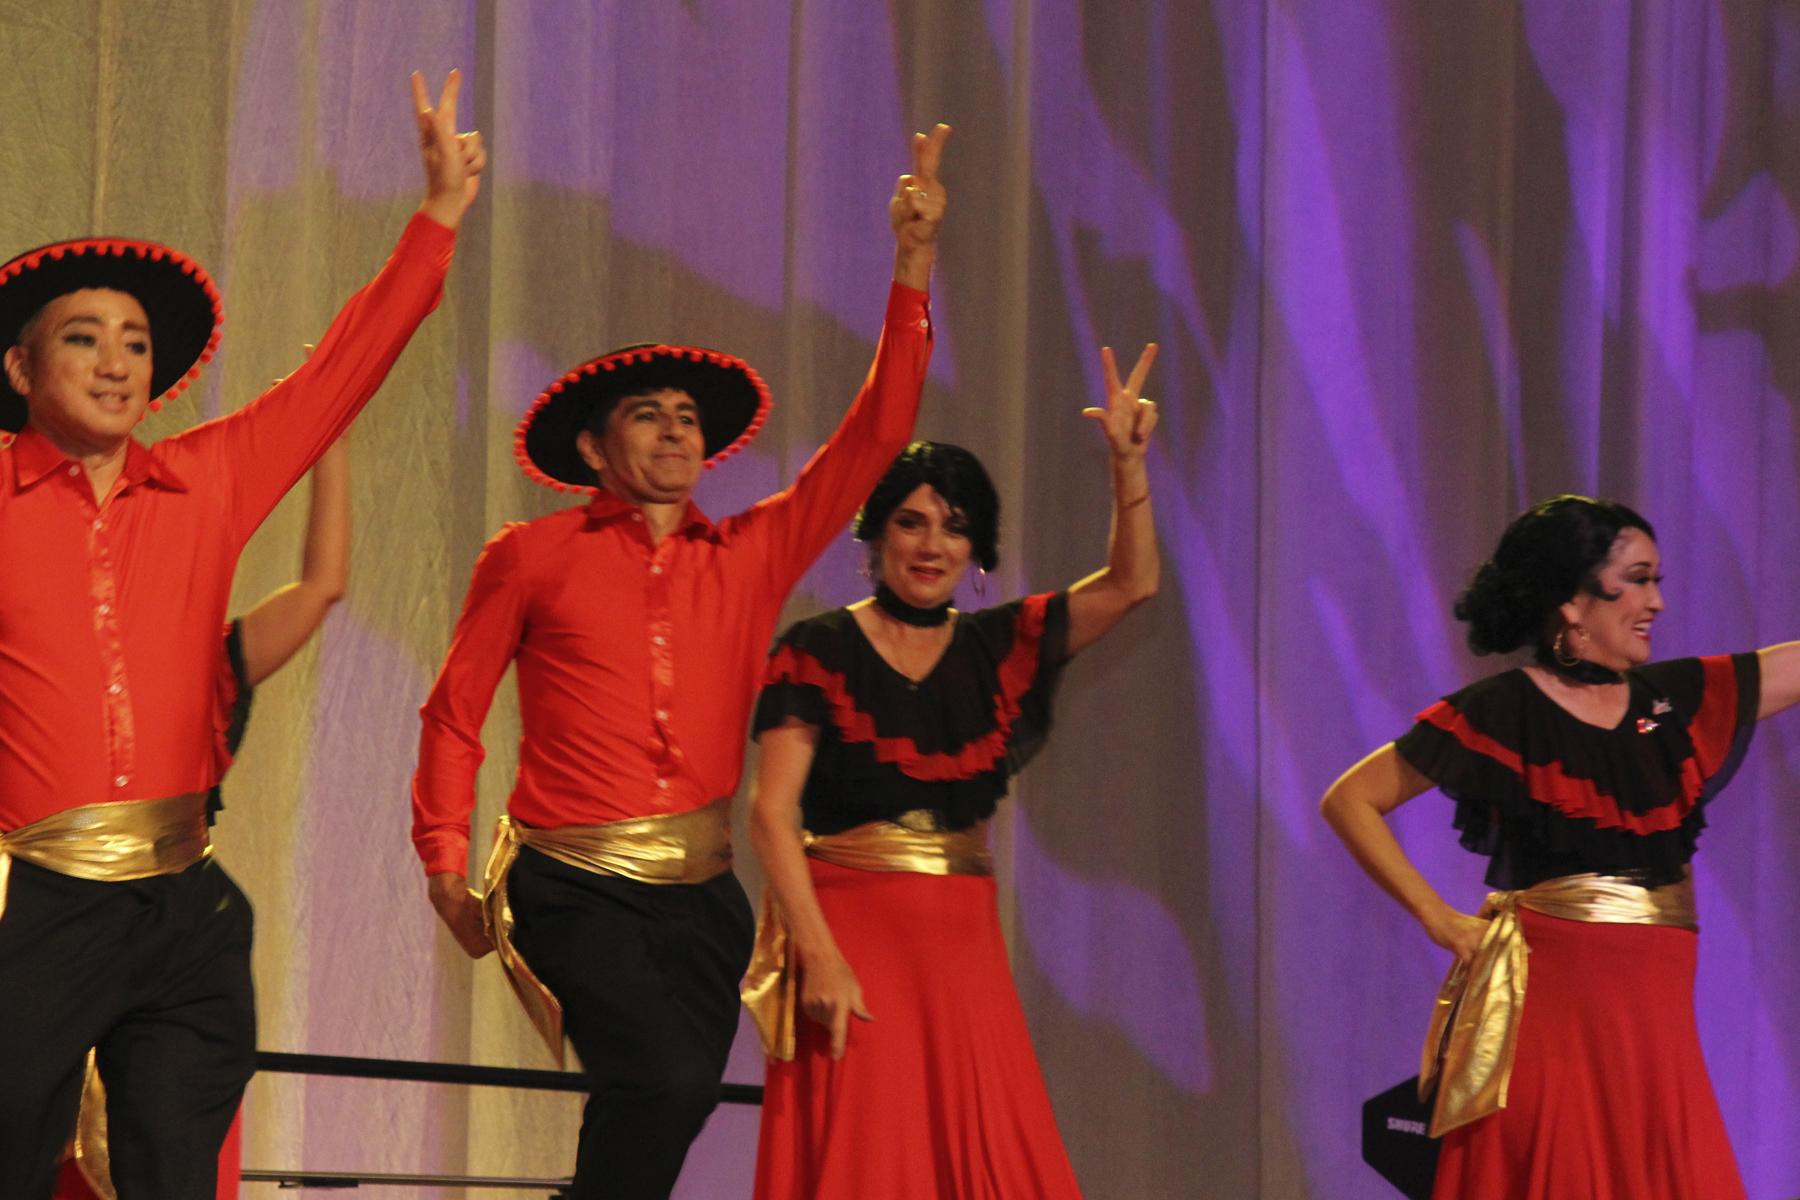 2016 AN EVENING AROUND THE WORLD: UNO, DOS, TRES! CFS Flamenco Dancers Bob Takamatsu (Goodfellow Bros., Inc.), Tab Bowers (American Savings Bank), Dr. Tyrie Jenkins (Jenkins Eye Care) & Kathy Inouye (Kobayashi Group LLC) dance on stage!